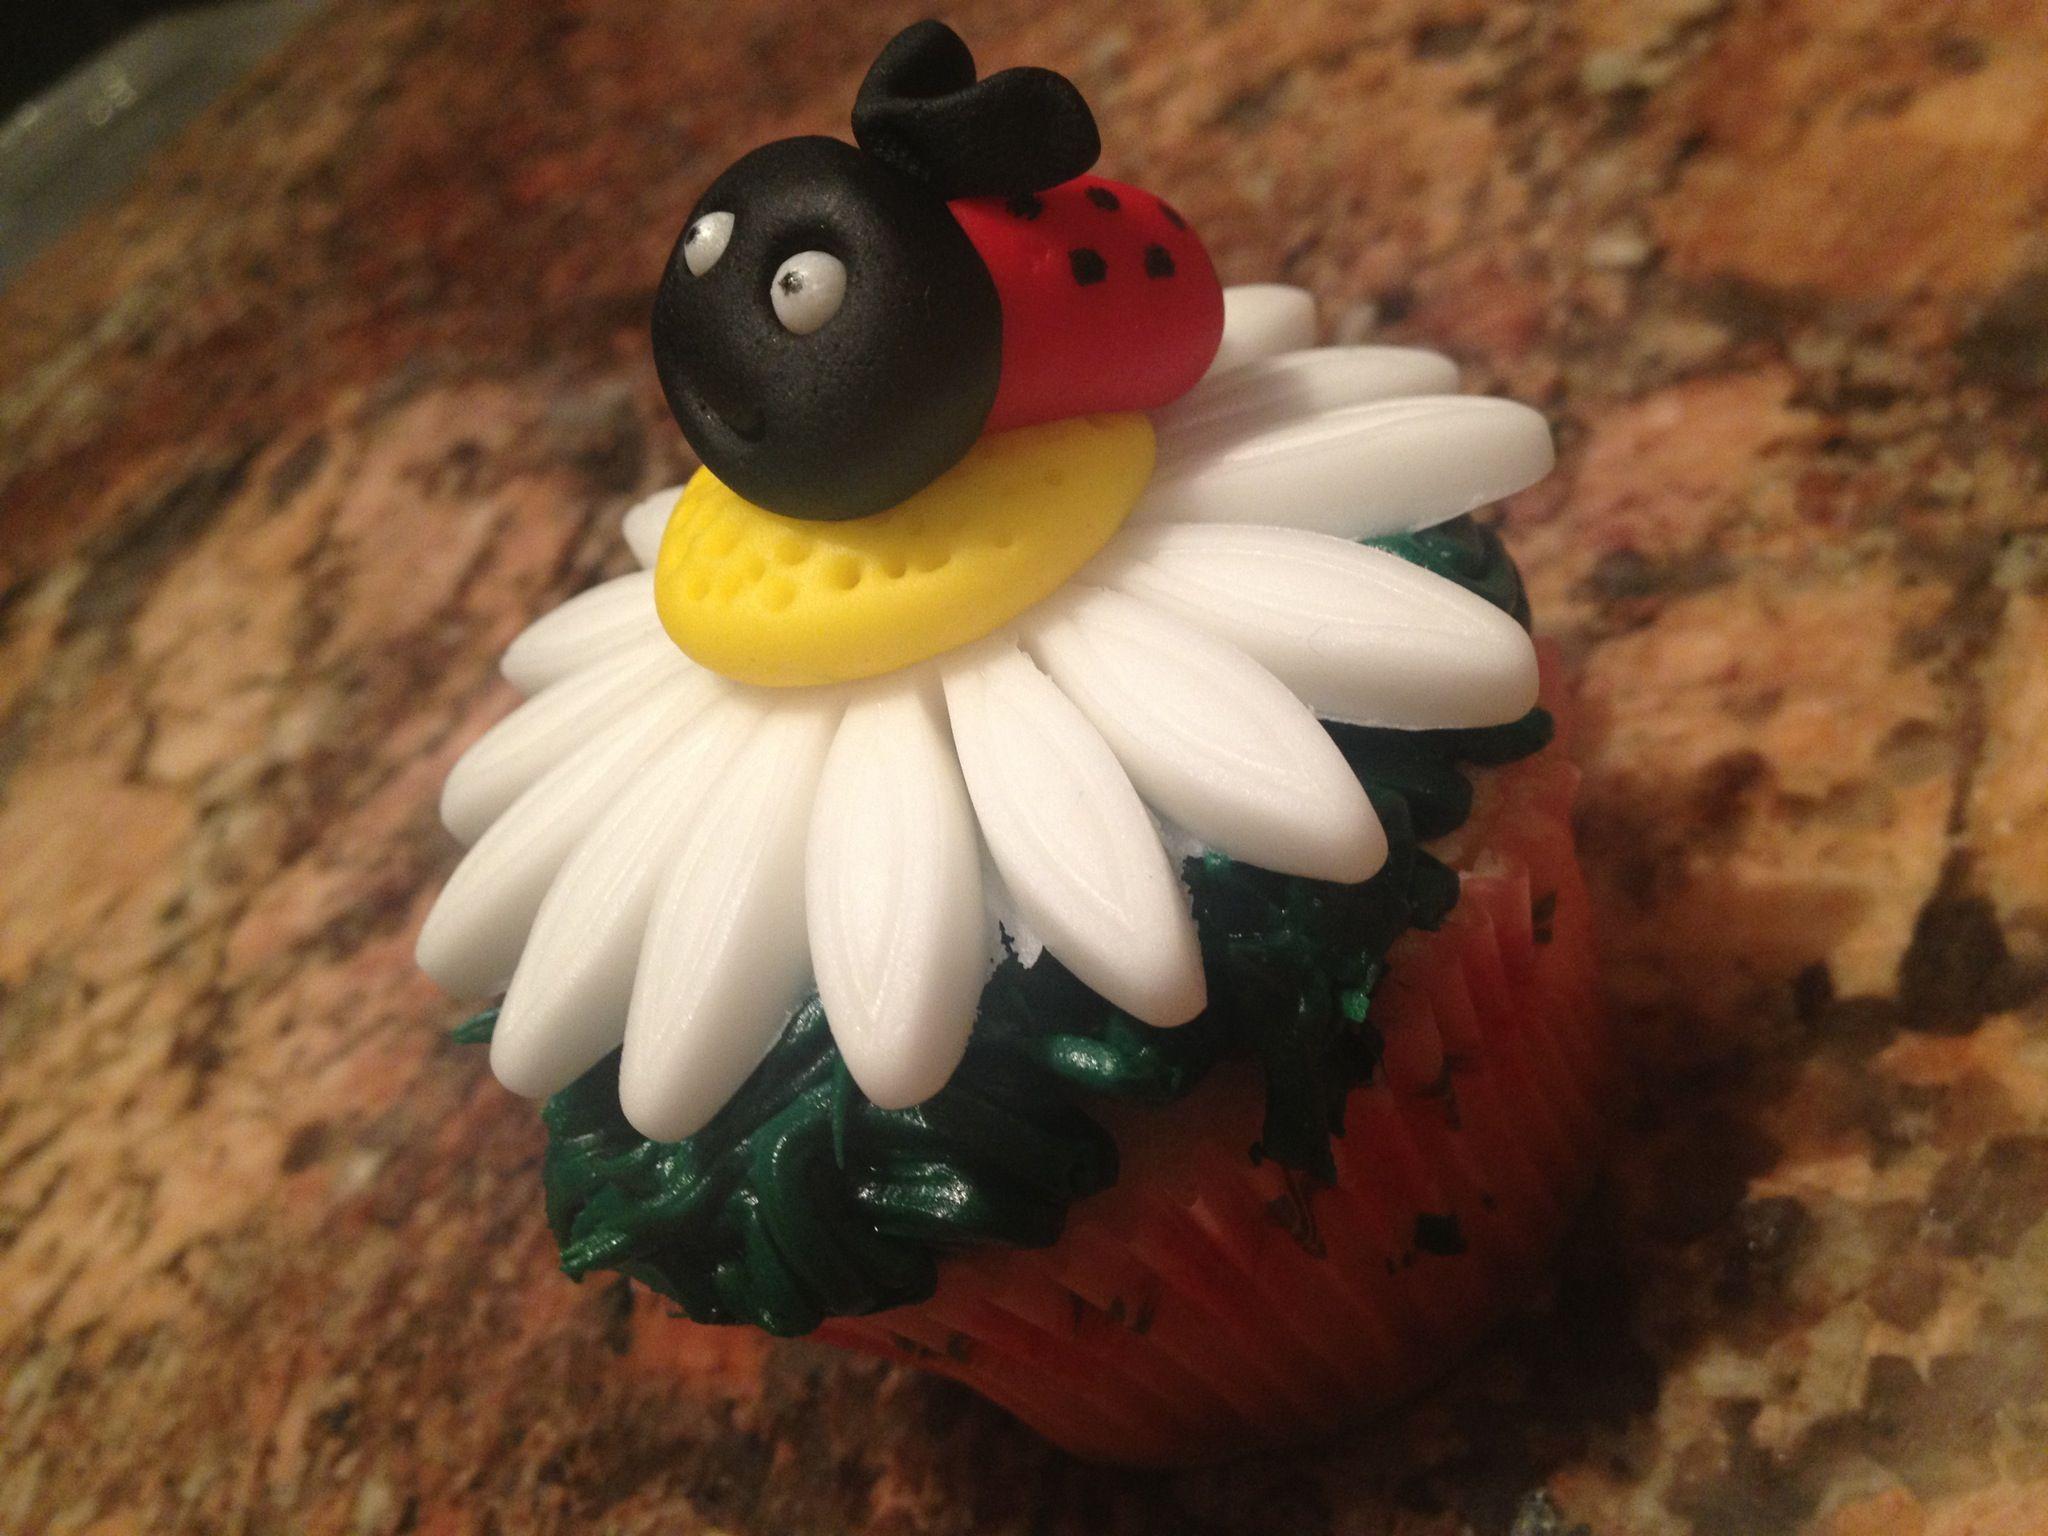 Lady big cupcake from cupcake 101 class!